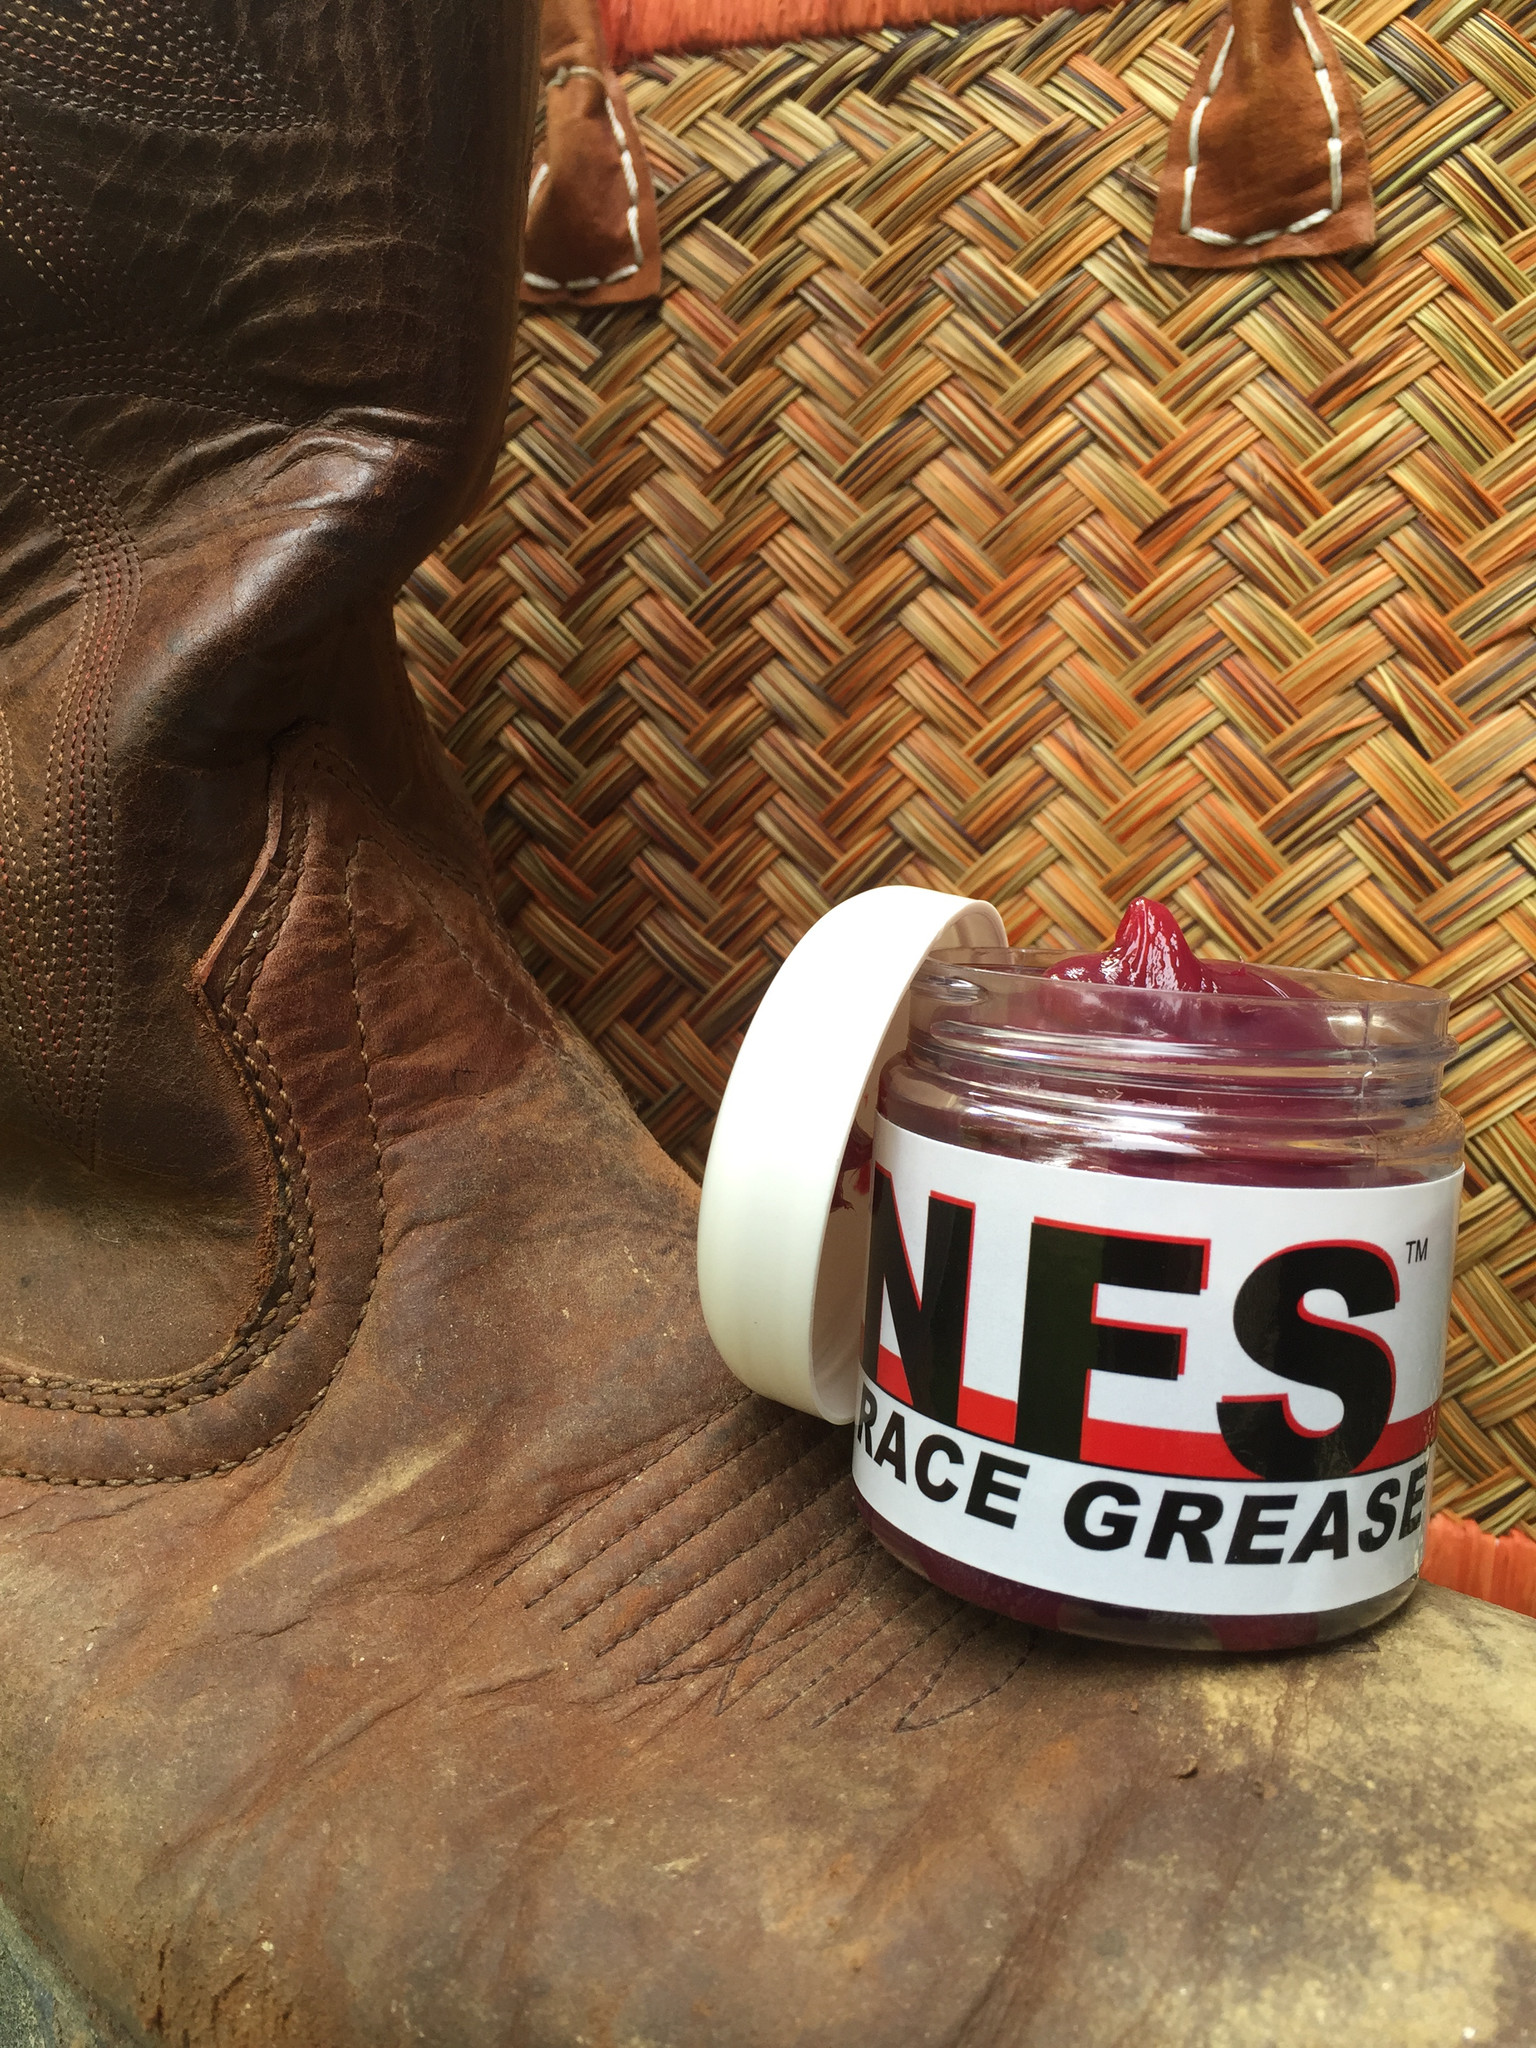 Nix-Frix-Shun, Race Grease